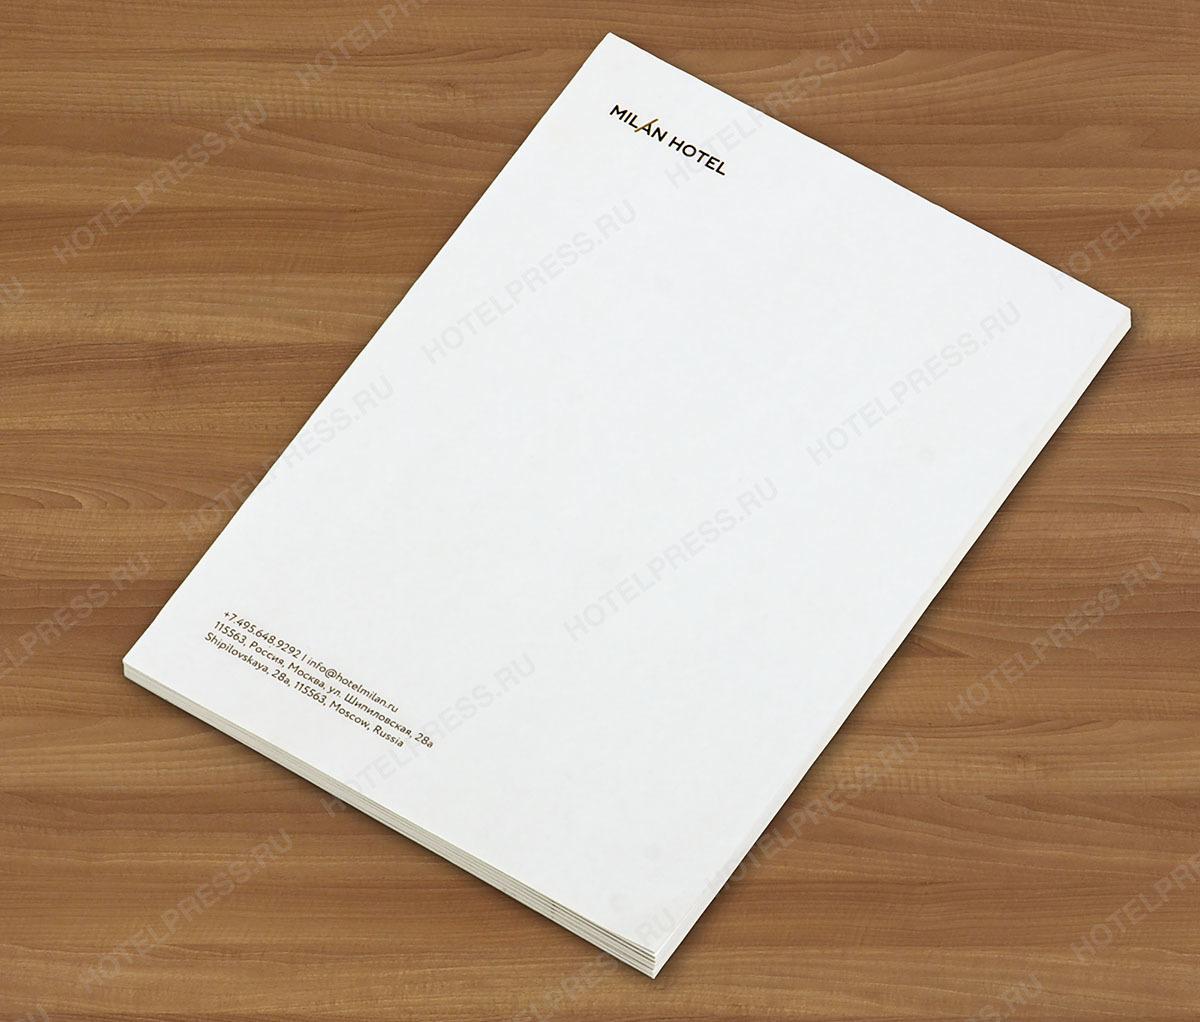 Блокнот А6 (105 х 147 мм) 50 листов с логотипом